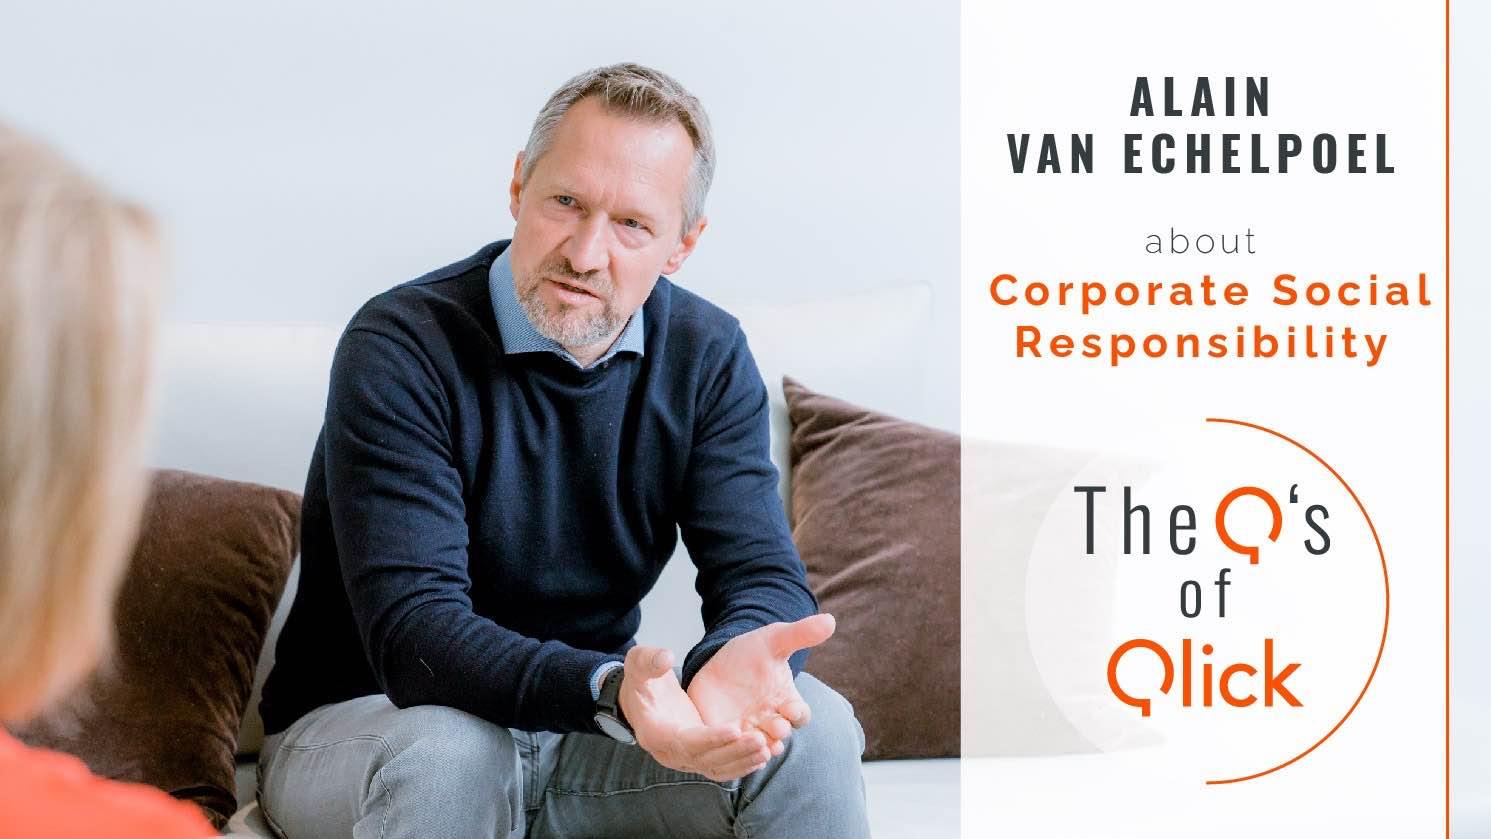 The Q's of Qlick: Corporate Social Responsibility